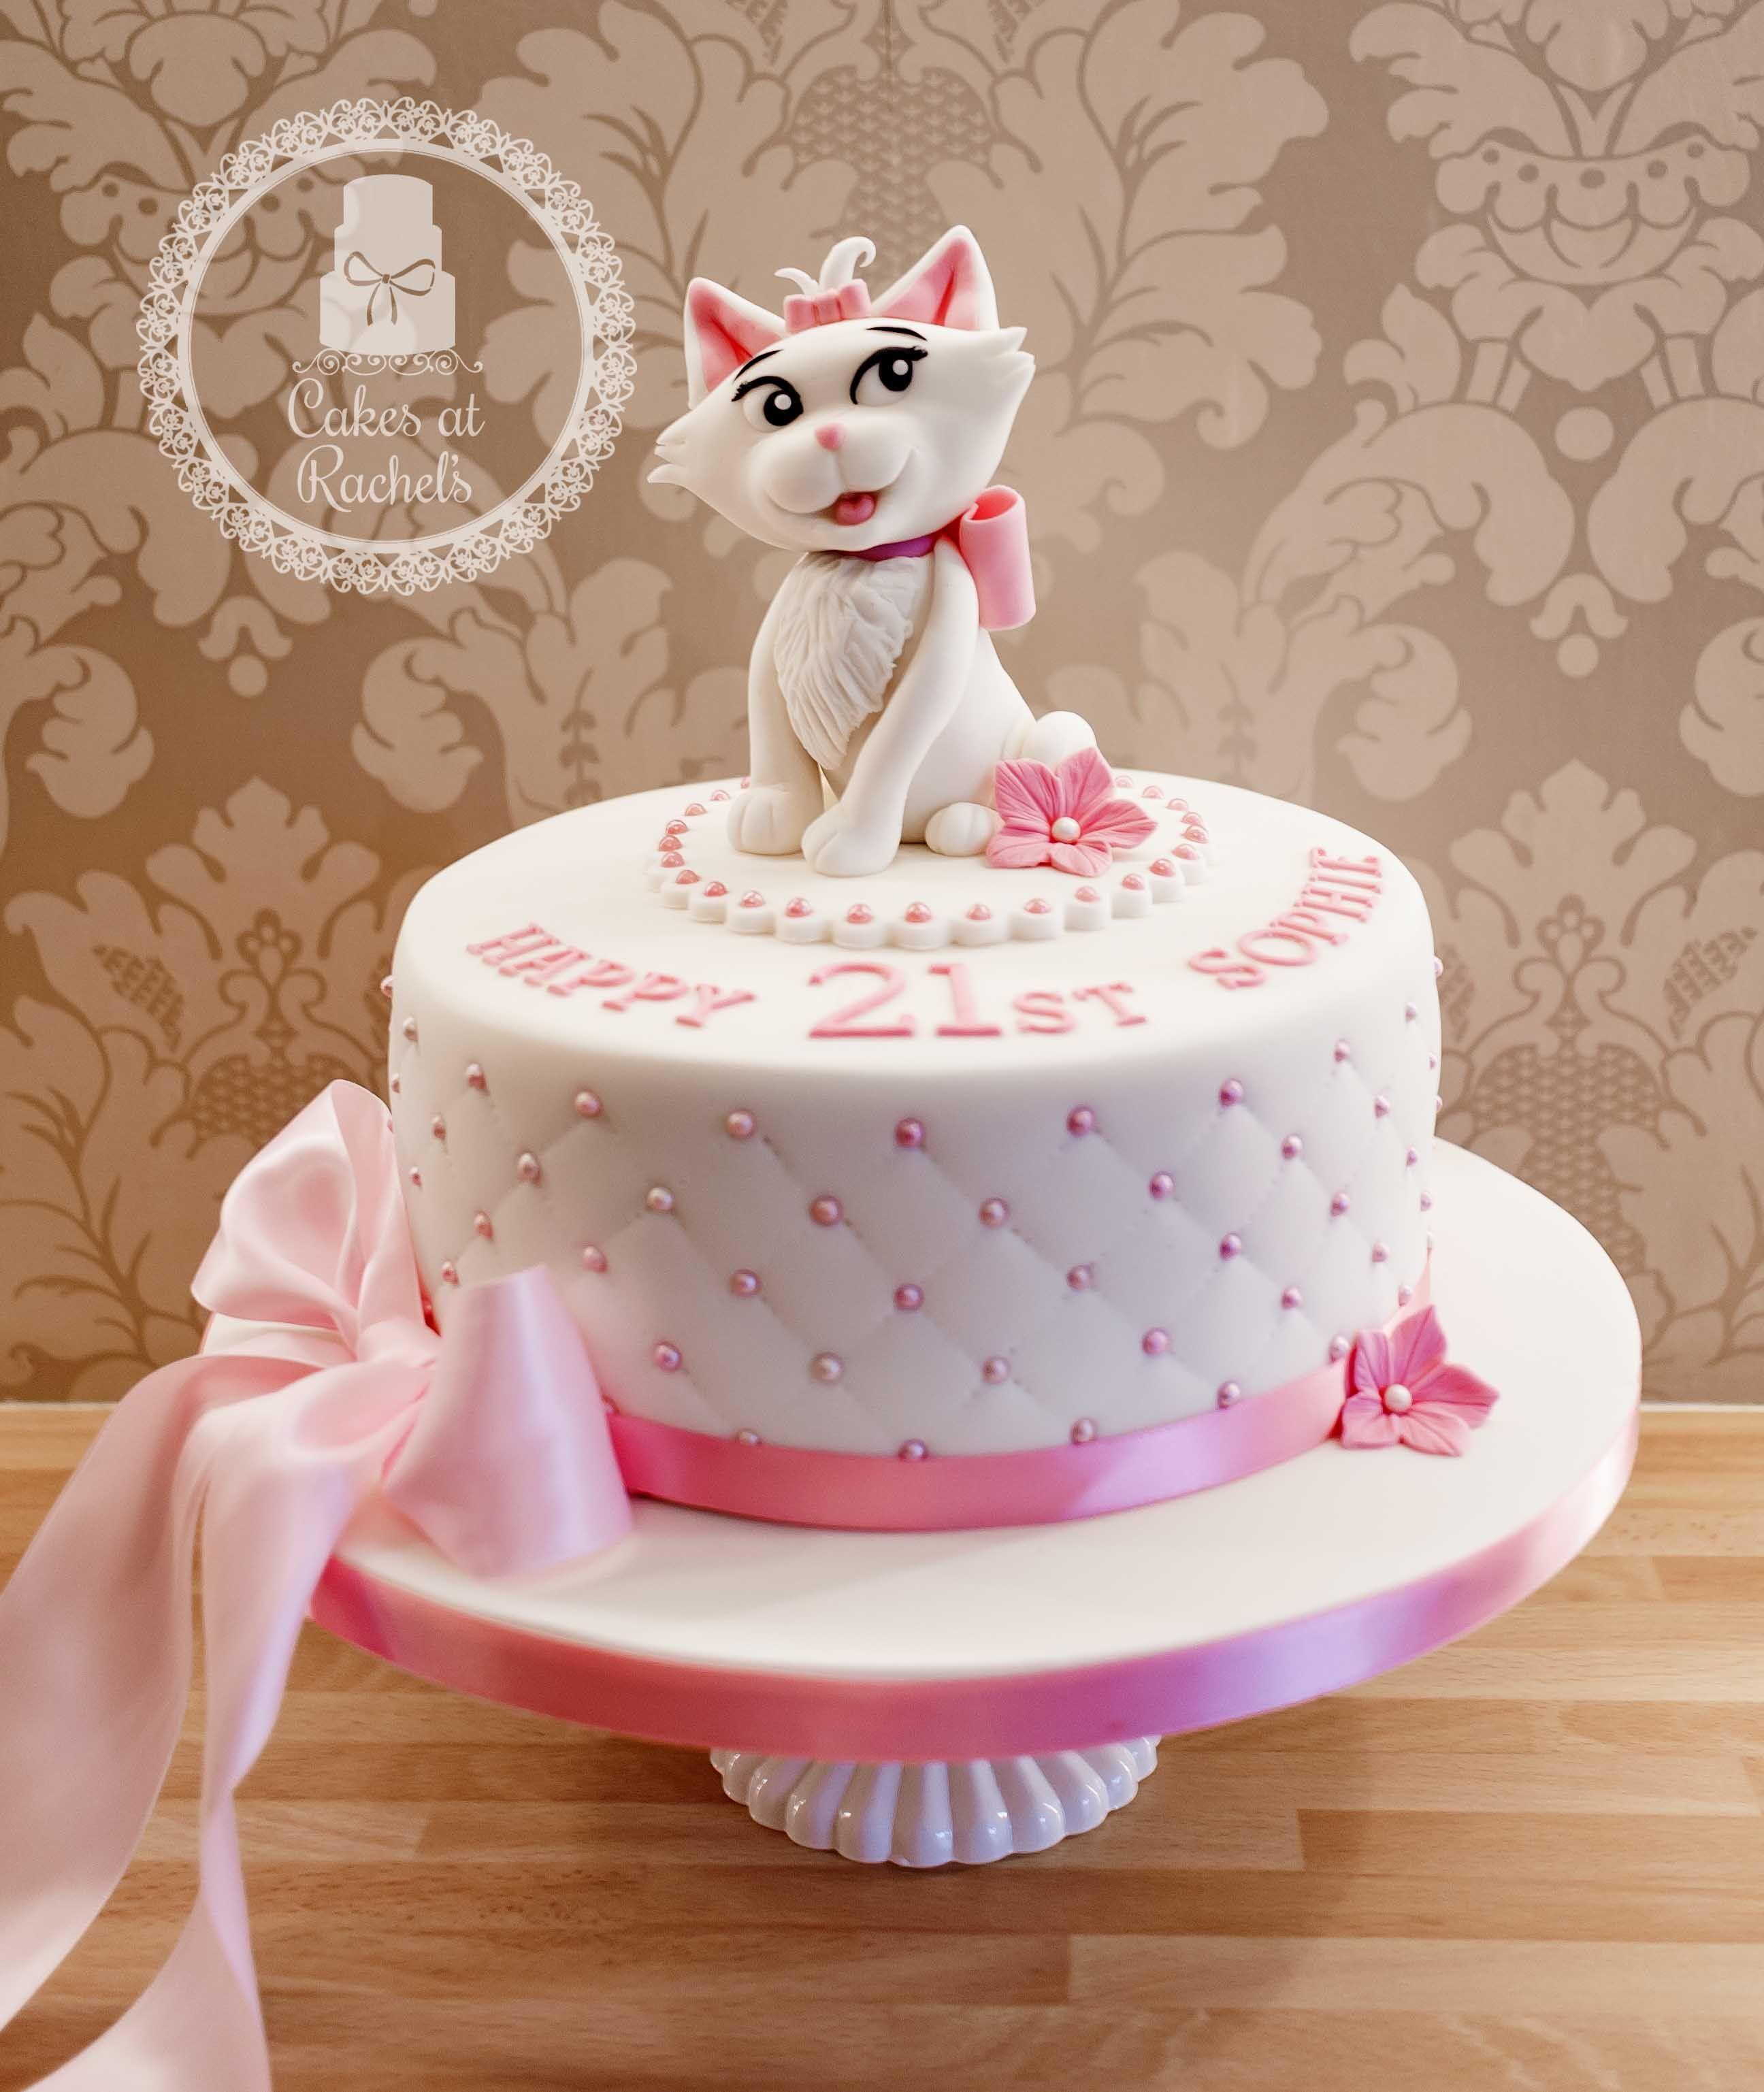 Aristocats themed cake 21st birthday blackpool based